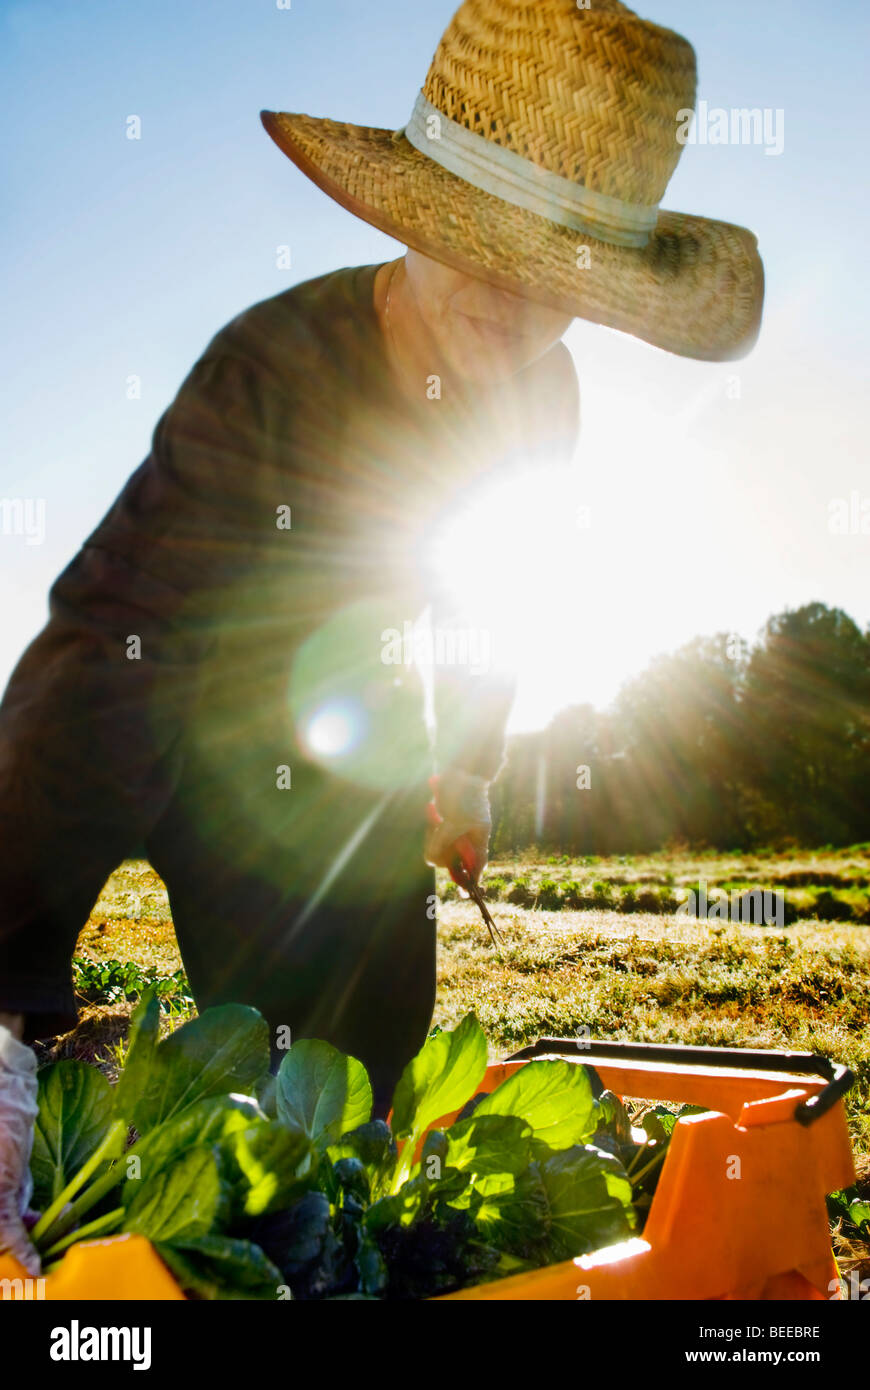 Tatsoi granja orgánica - productor orgánico certificado Imagen De Stock